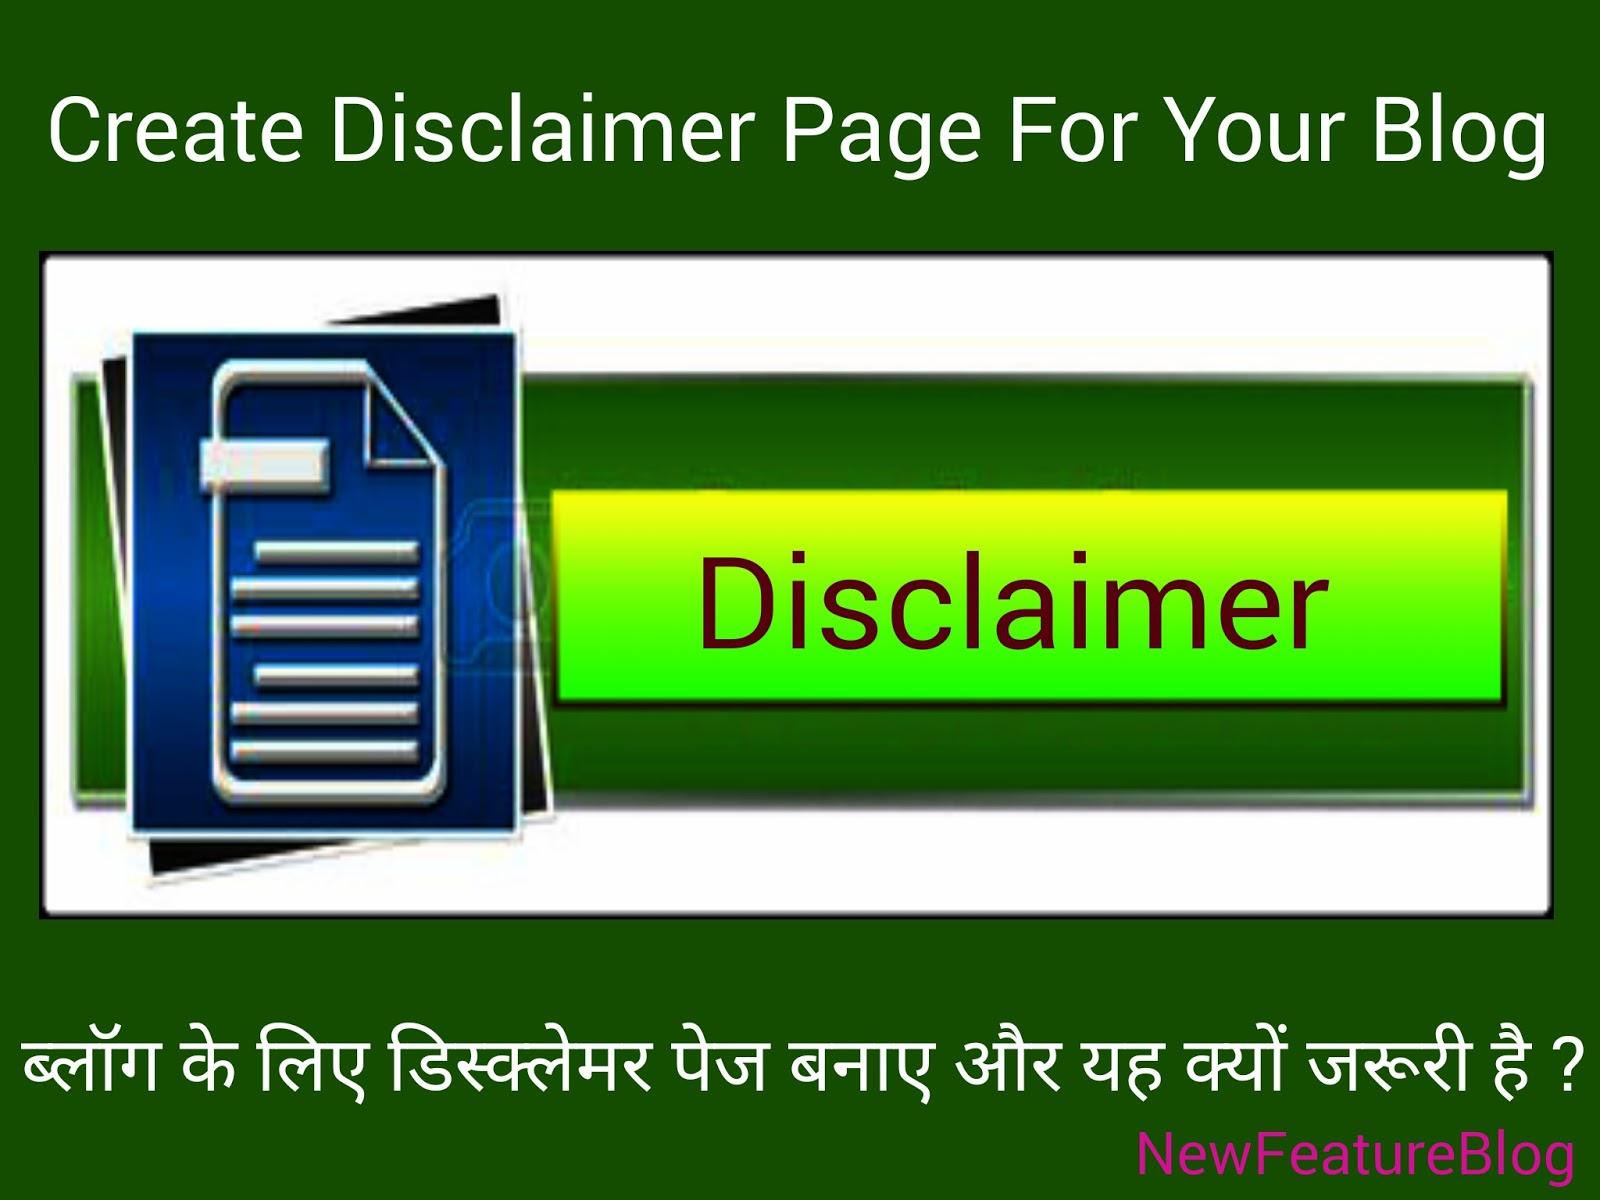 disclaimer-page-kaise-banaye-blog-ke-liye